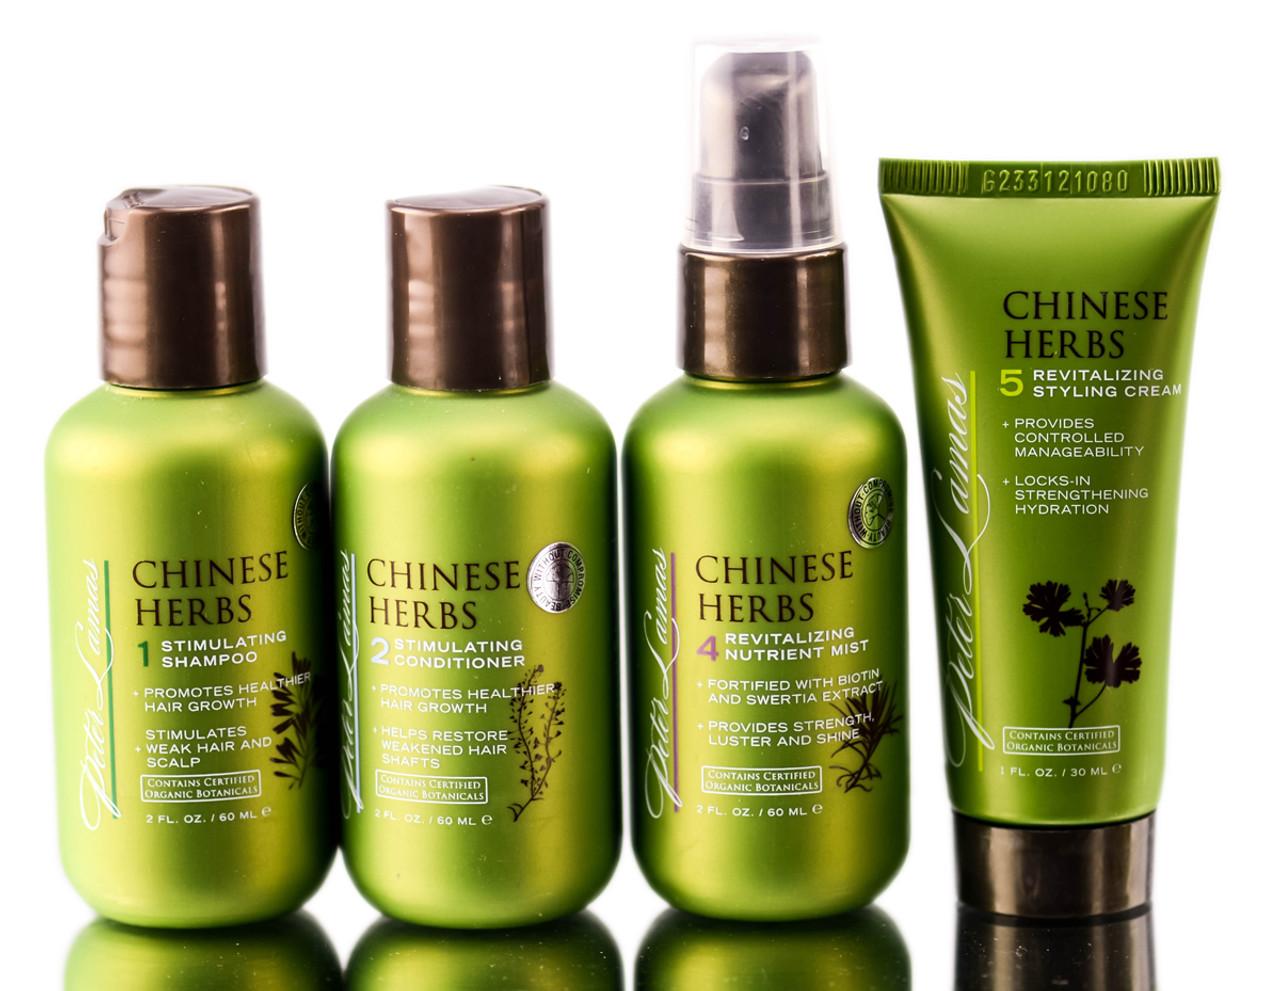 Peter Lamas Chinese Herbs Hair Growth Kit - SleekShop.com ...